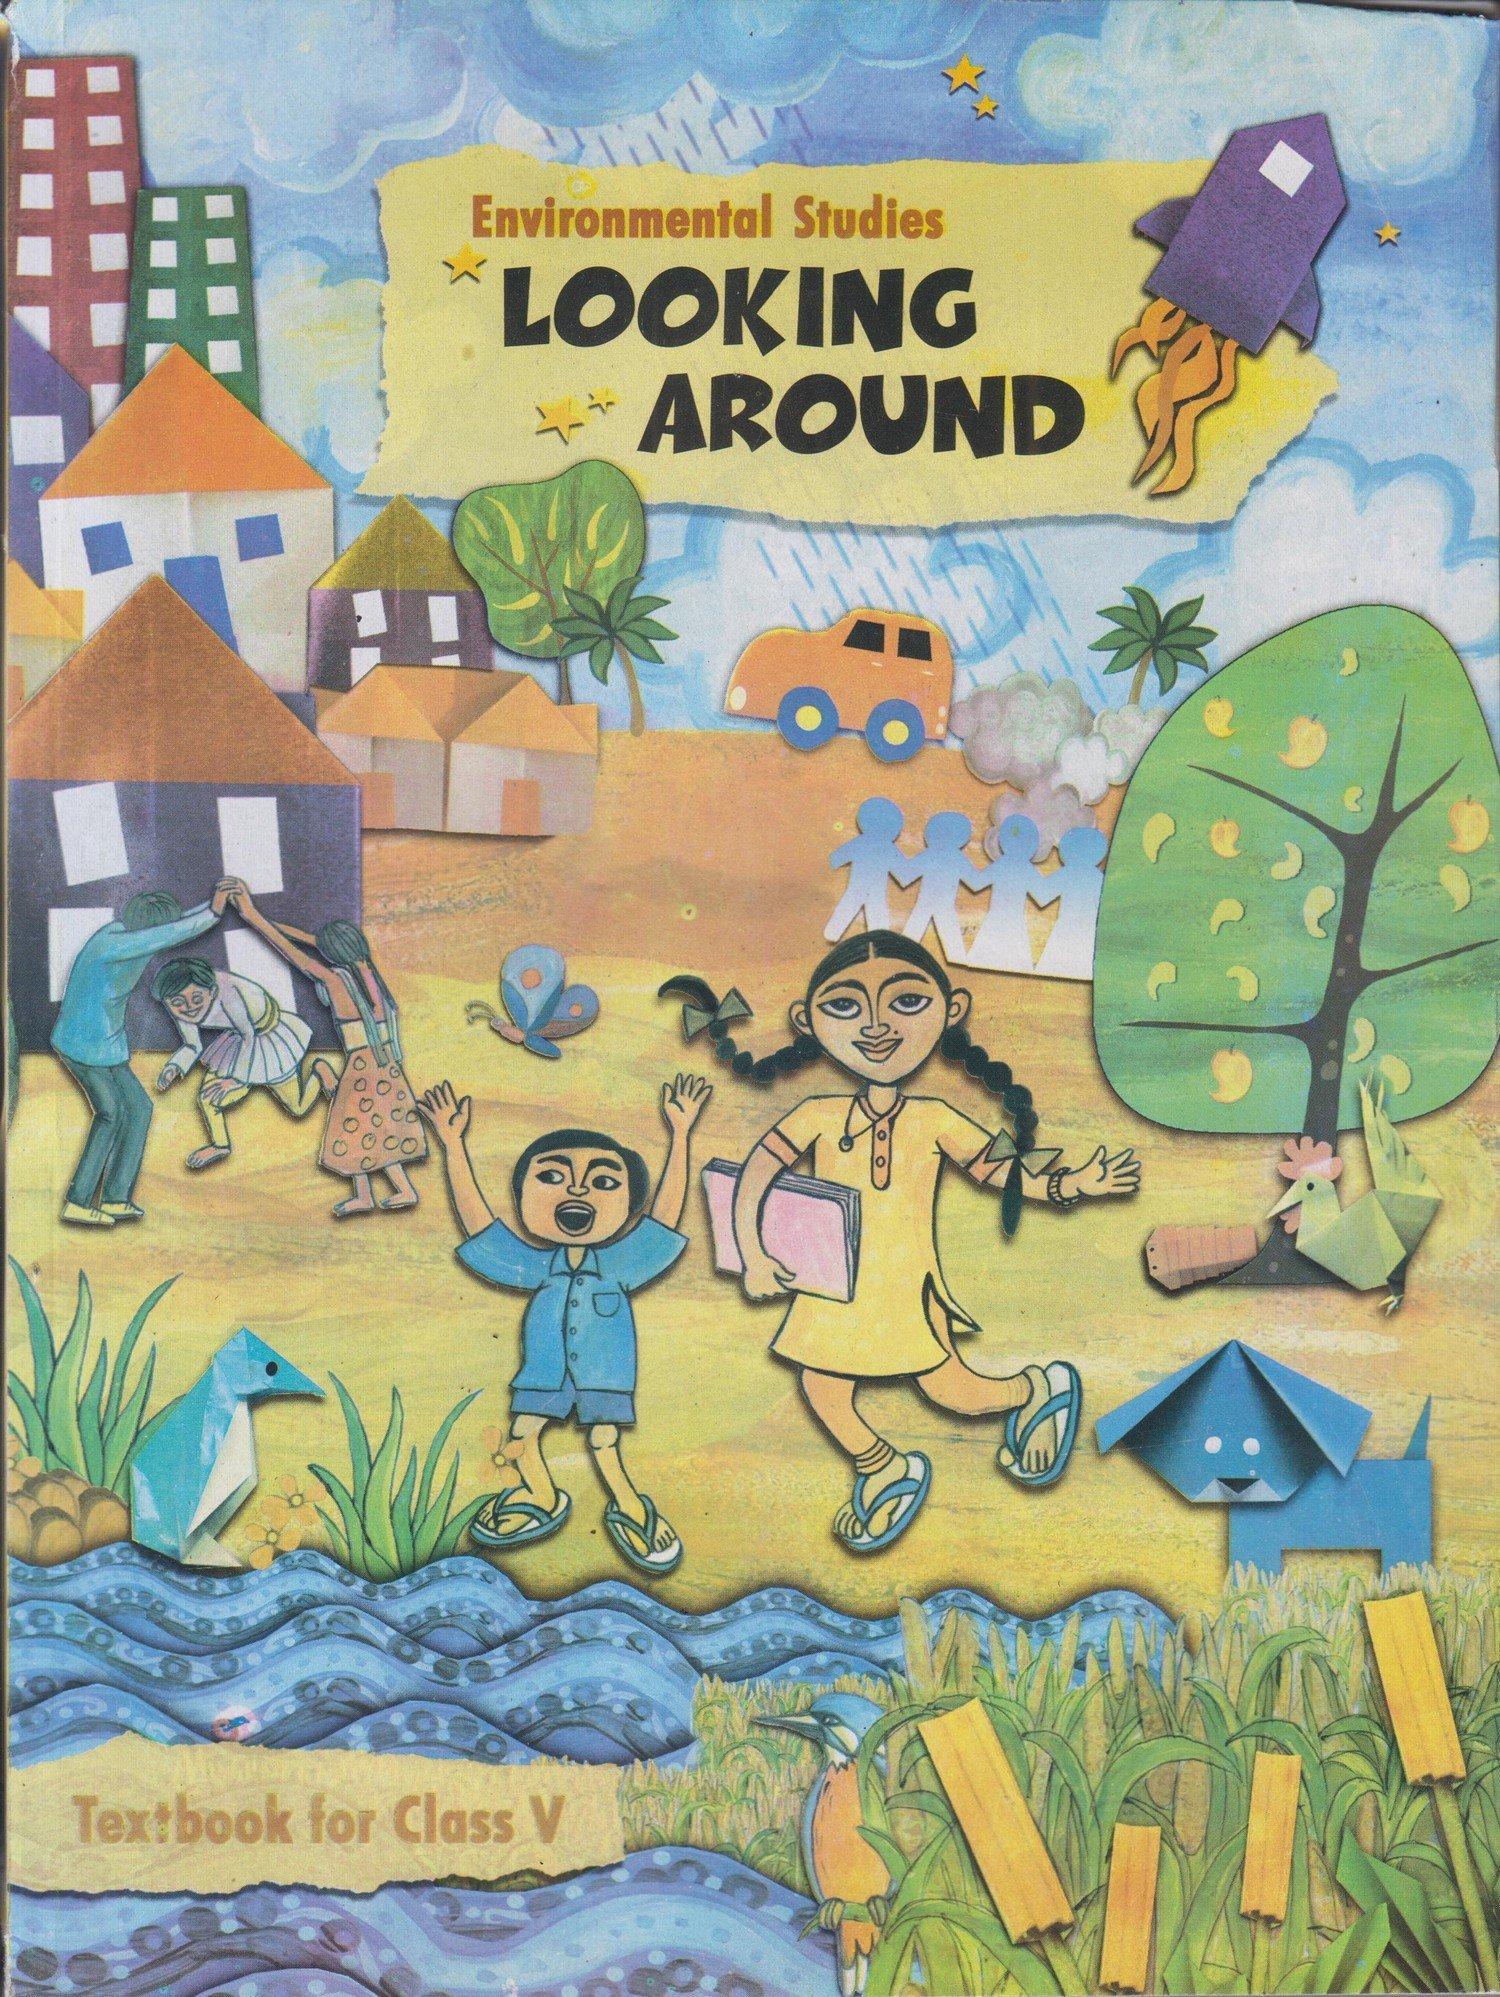 Enviromental Studies Looking Around For Class 5- 529: Amazon